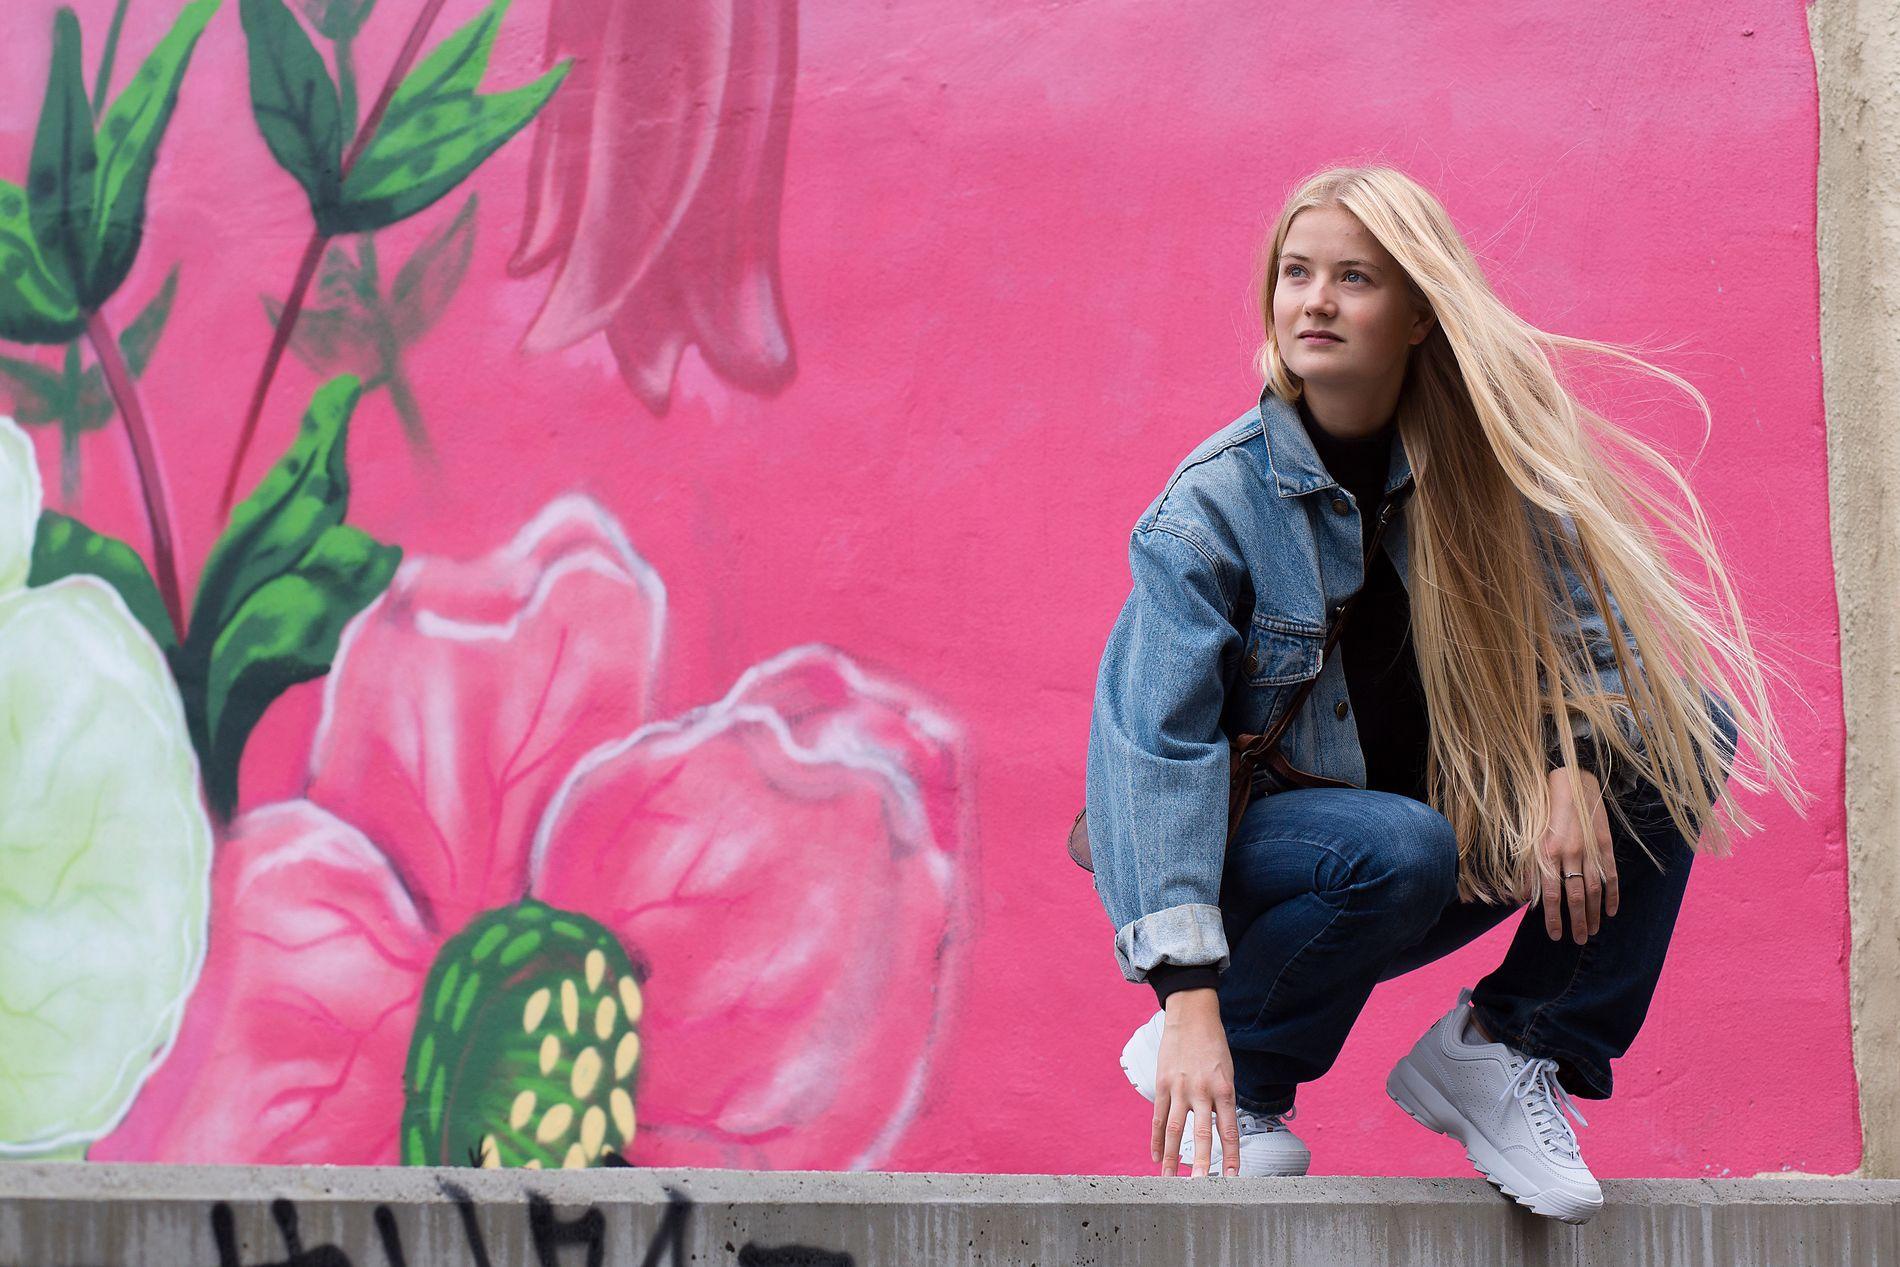 SPILLER PÅ TALENTFEST: Amalie Holt Kleive er blant artistene som spiller på årets Vill Vill Vest.